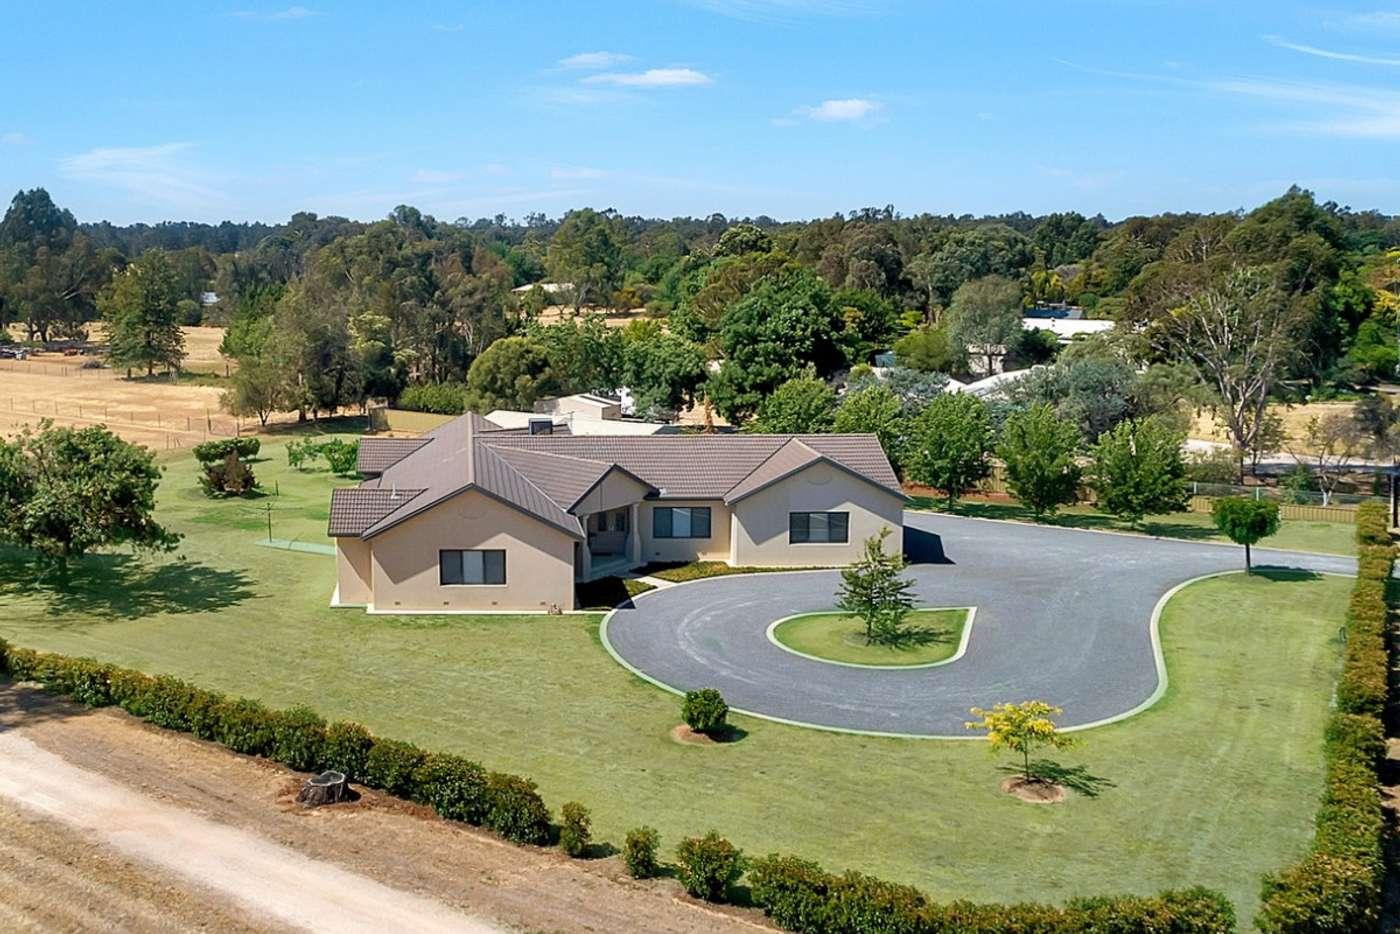 Main view of Homely house listing, 5 Waldara Drive, Wangaratta VIC 3677